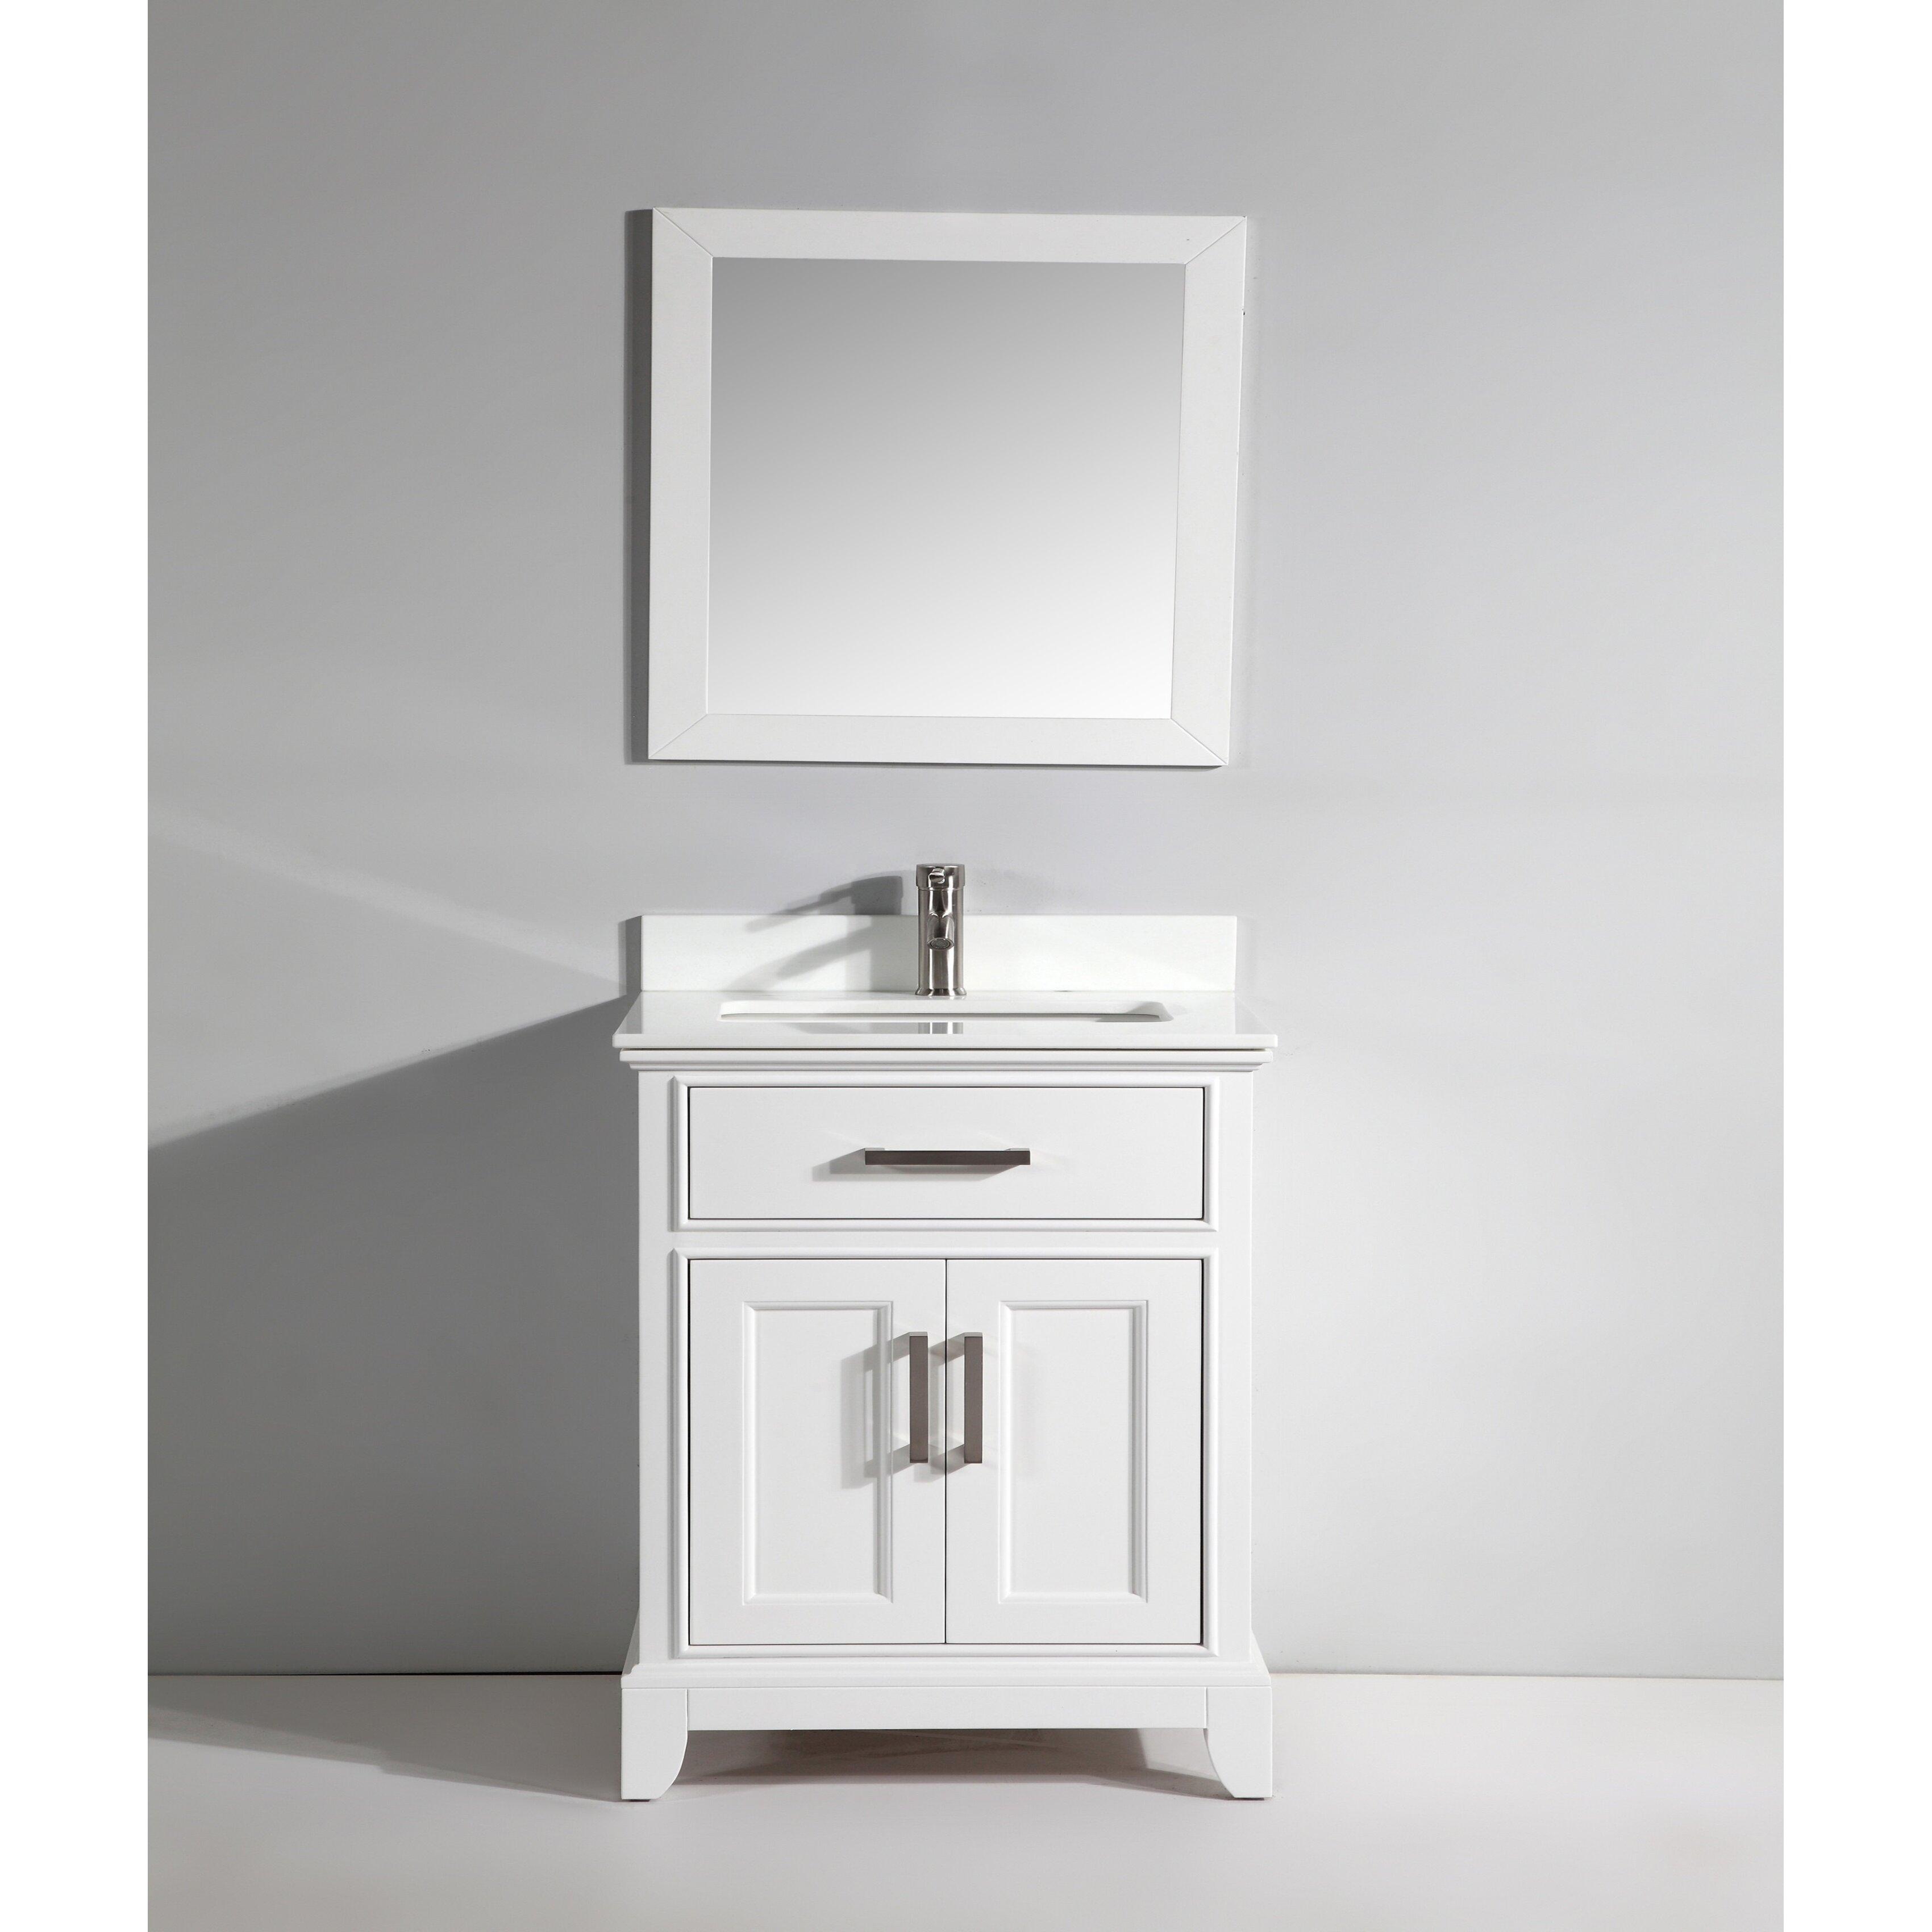 27 Inch Bathroom Vanity My Web Value